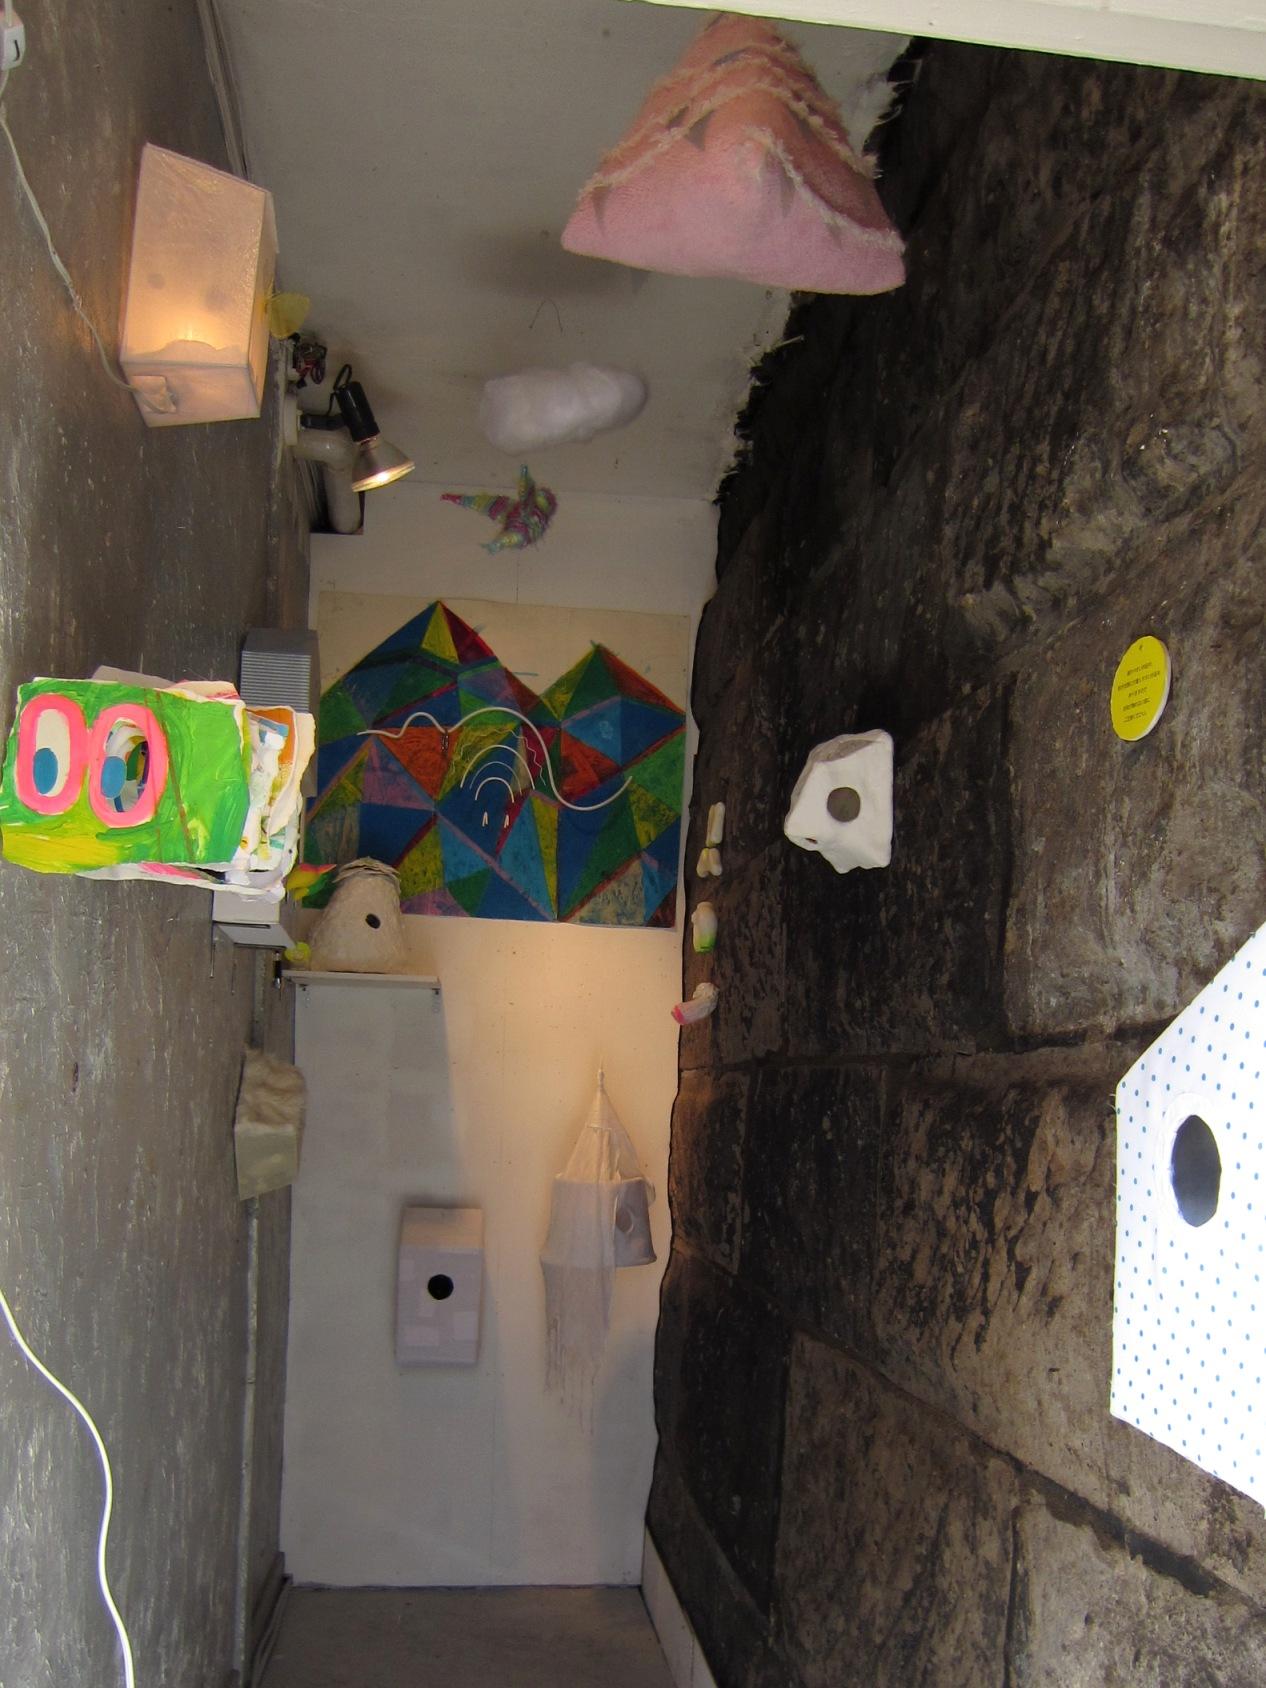 2020) 「jobin. とpaterの二人展 『ハルナデ展2013』」 ニュー・スター 4月15 日(月)~4月29日(日)  _f0126829_051398.jpg